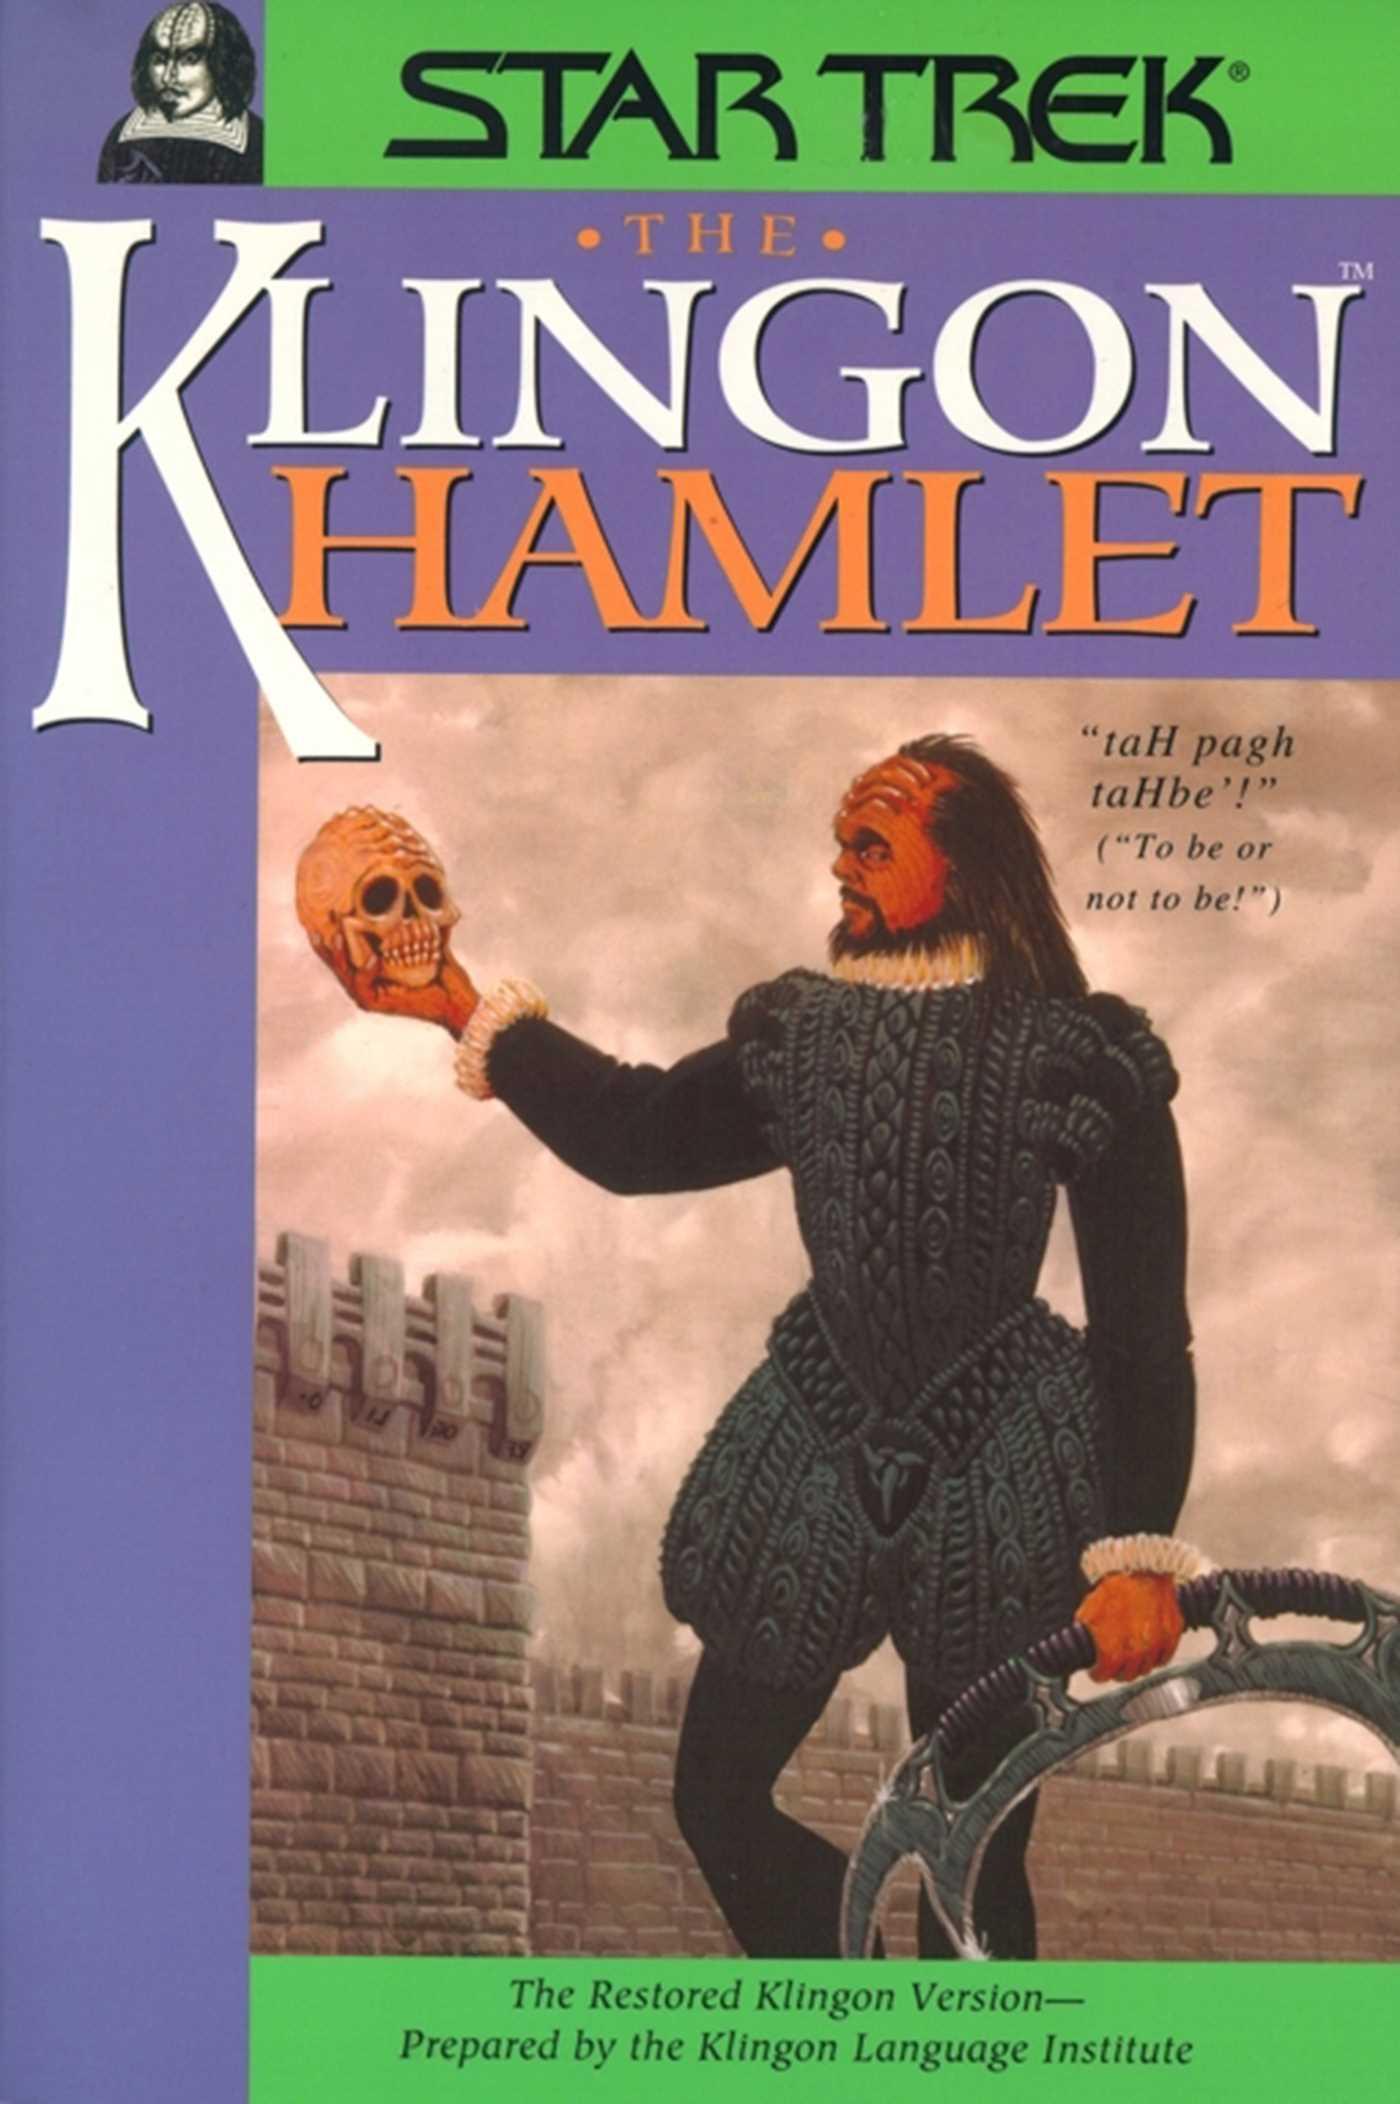 The klingon hamlet 9781471107108 hr